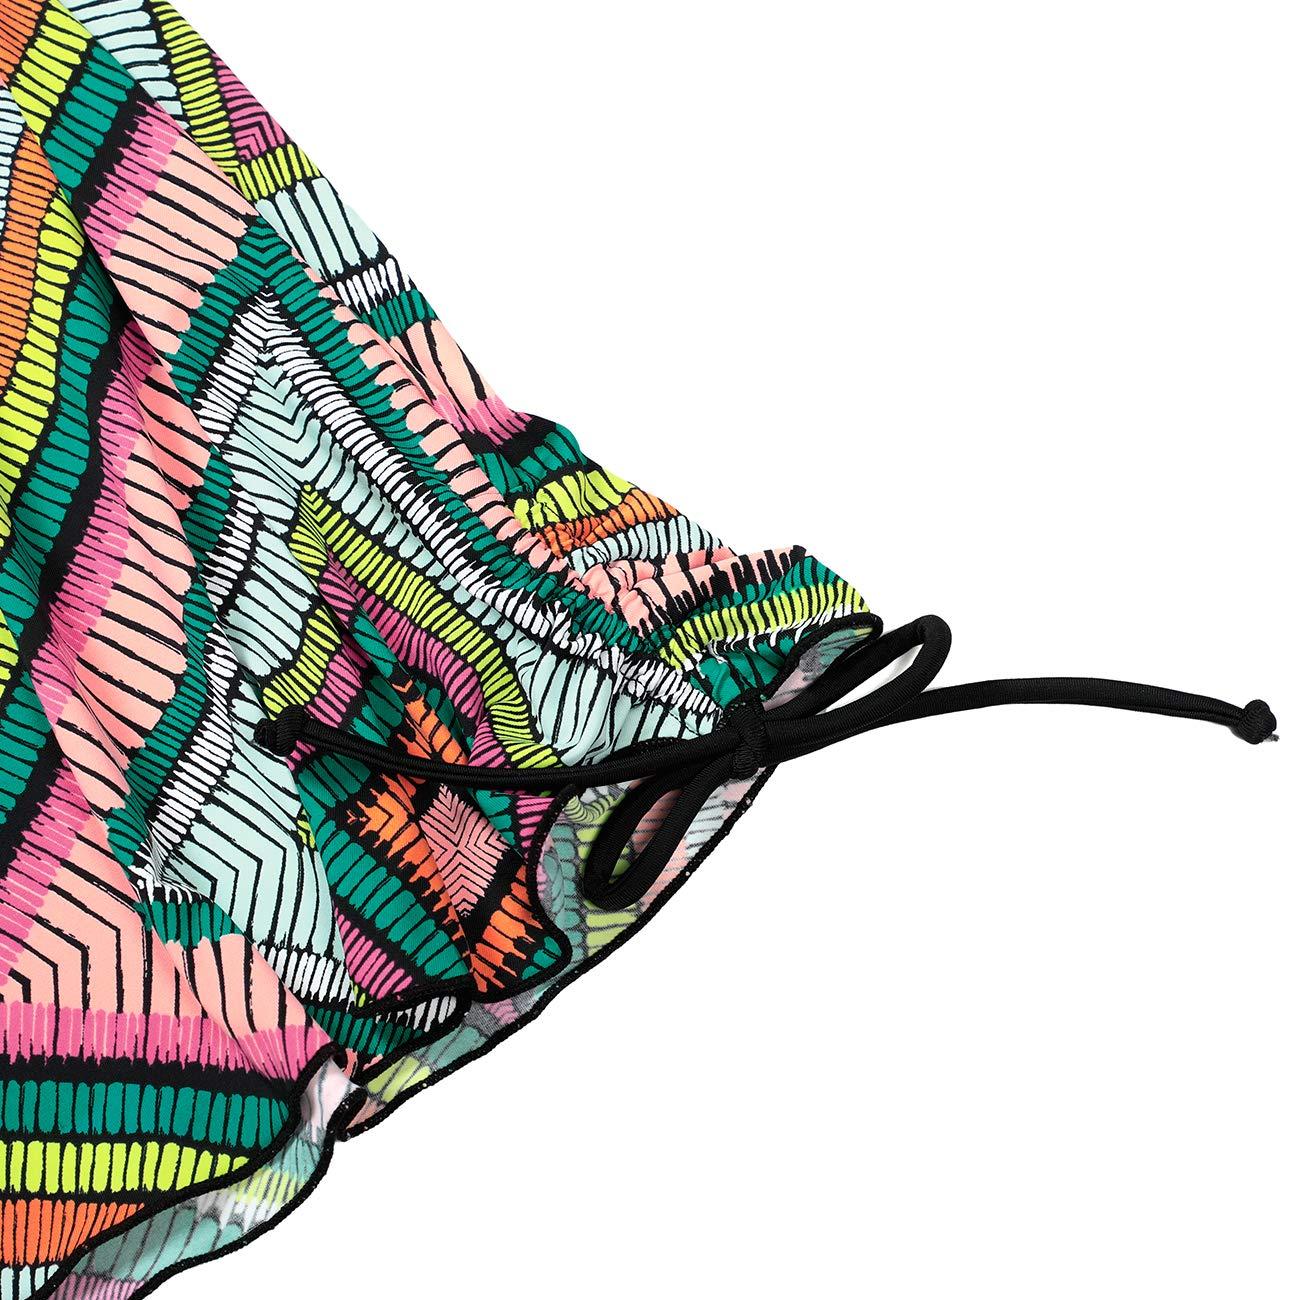 28 Pattern Optional DAYU Damen Retro Tankini Sets Gro/ße Gr/ö/ße Bademode R/ückenfrei Tankini Bikini Set Top+Shorts Swimwear Beachwear Badeanzug EU 42-58